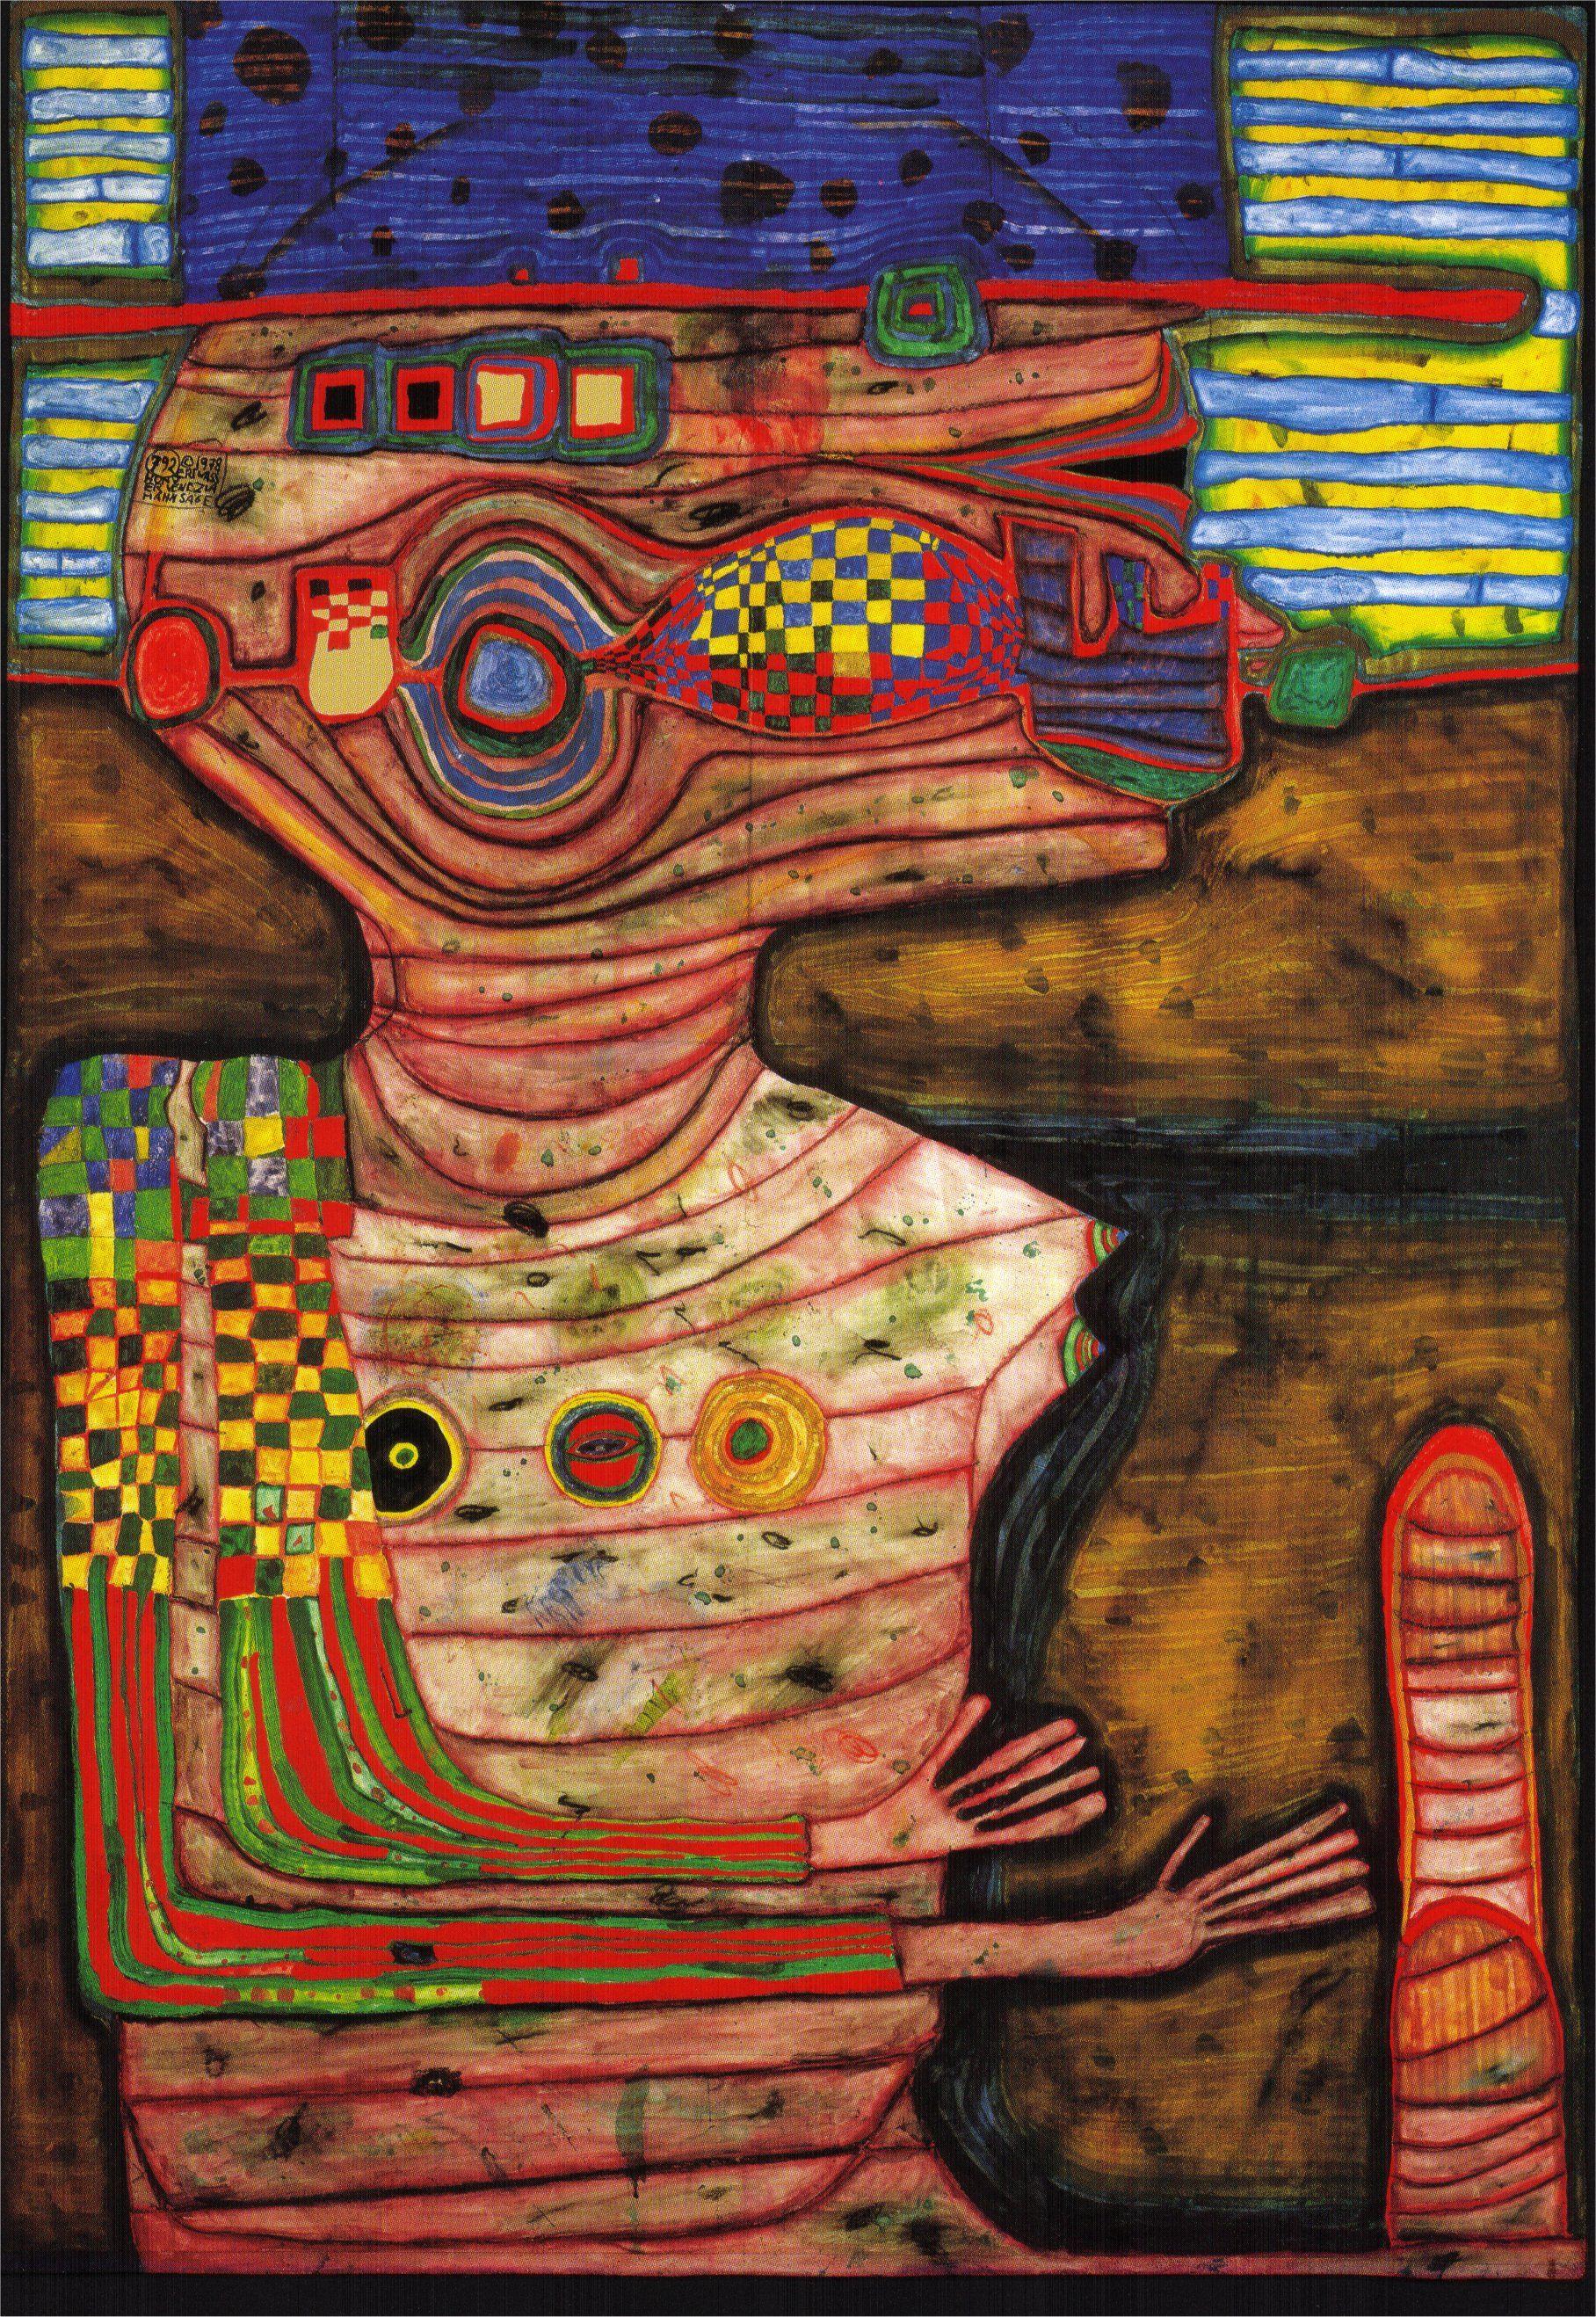 Friedensreich Hundertwasser (Austrian, 1928-2000) |